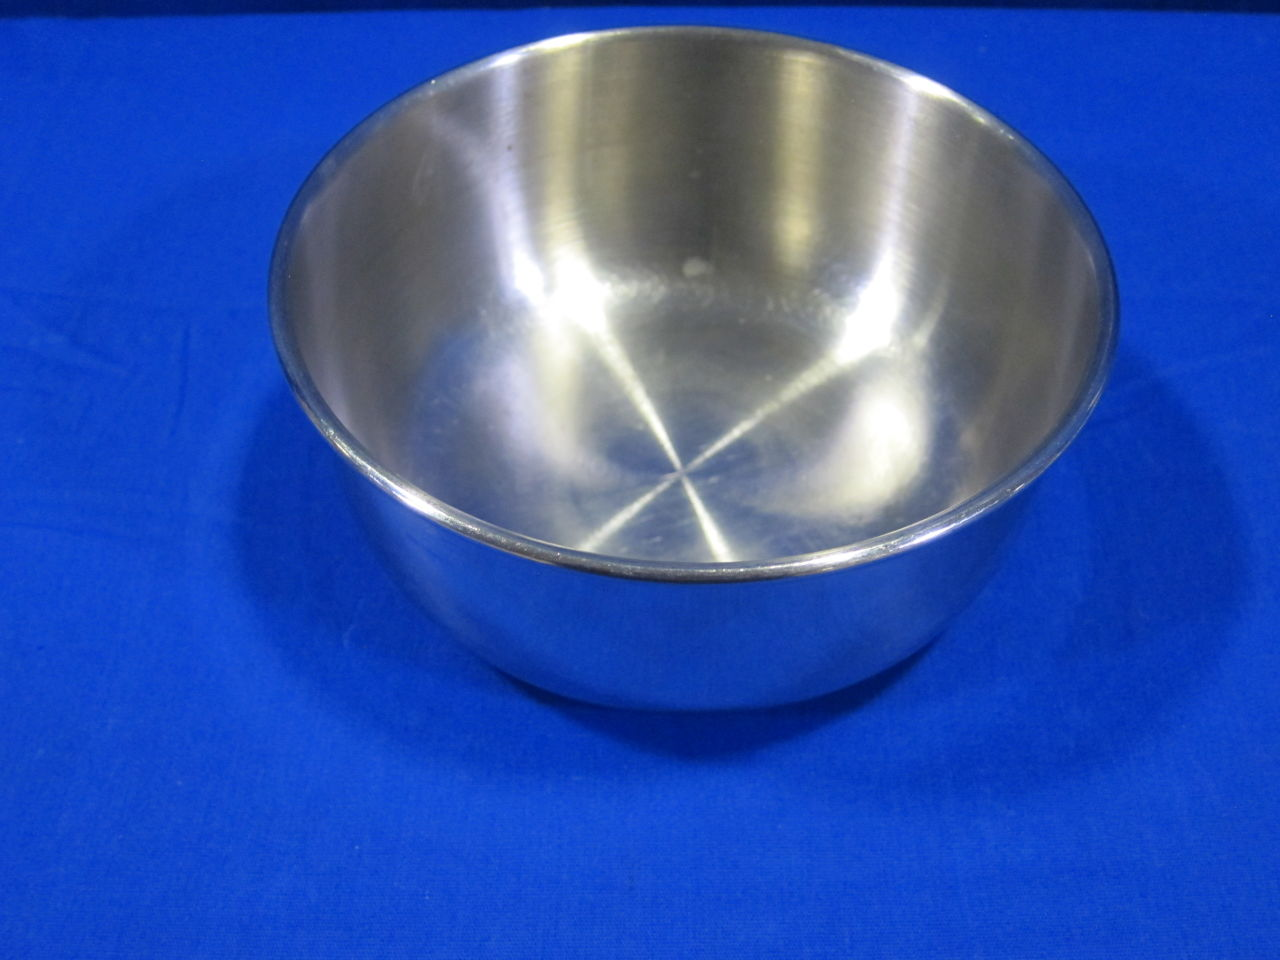 VOLLRATH 8741 Cysto Bowl